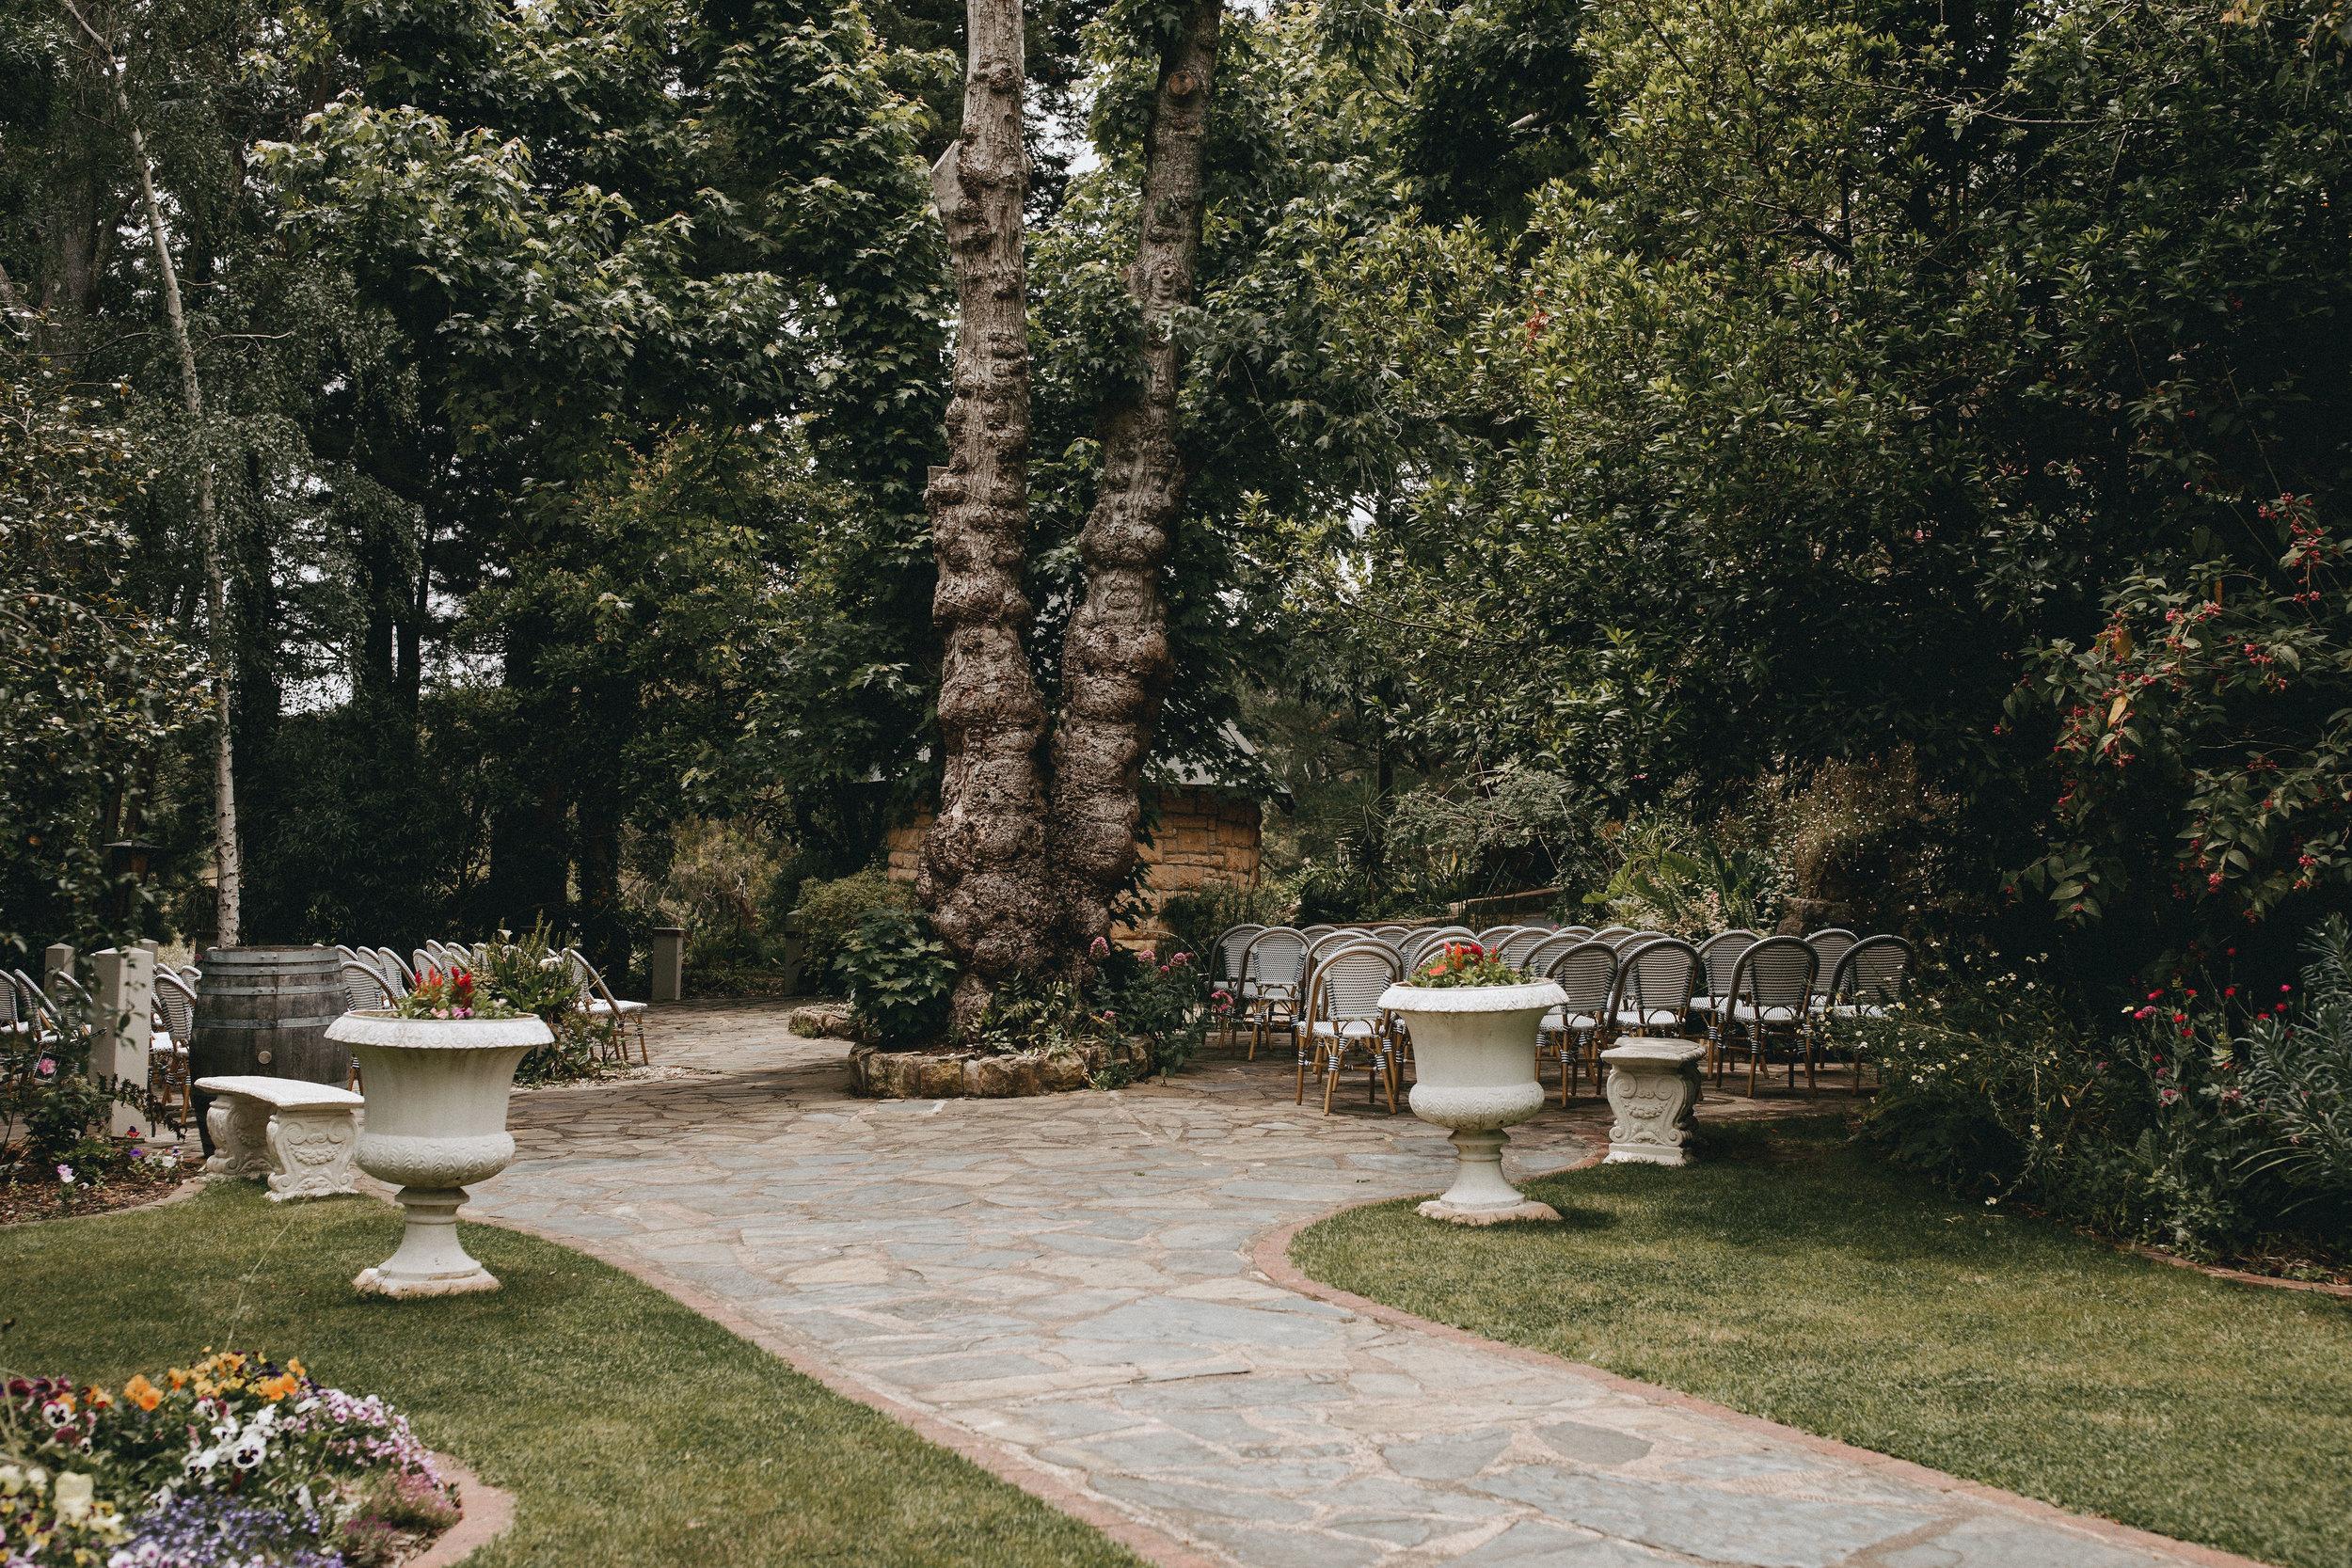 BYBHS_HYGGE_WEDDING_HUGH&GEORGIE_HI-RES_58.jpg